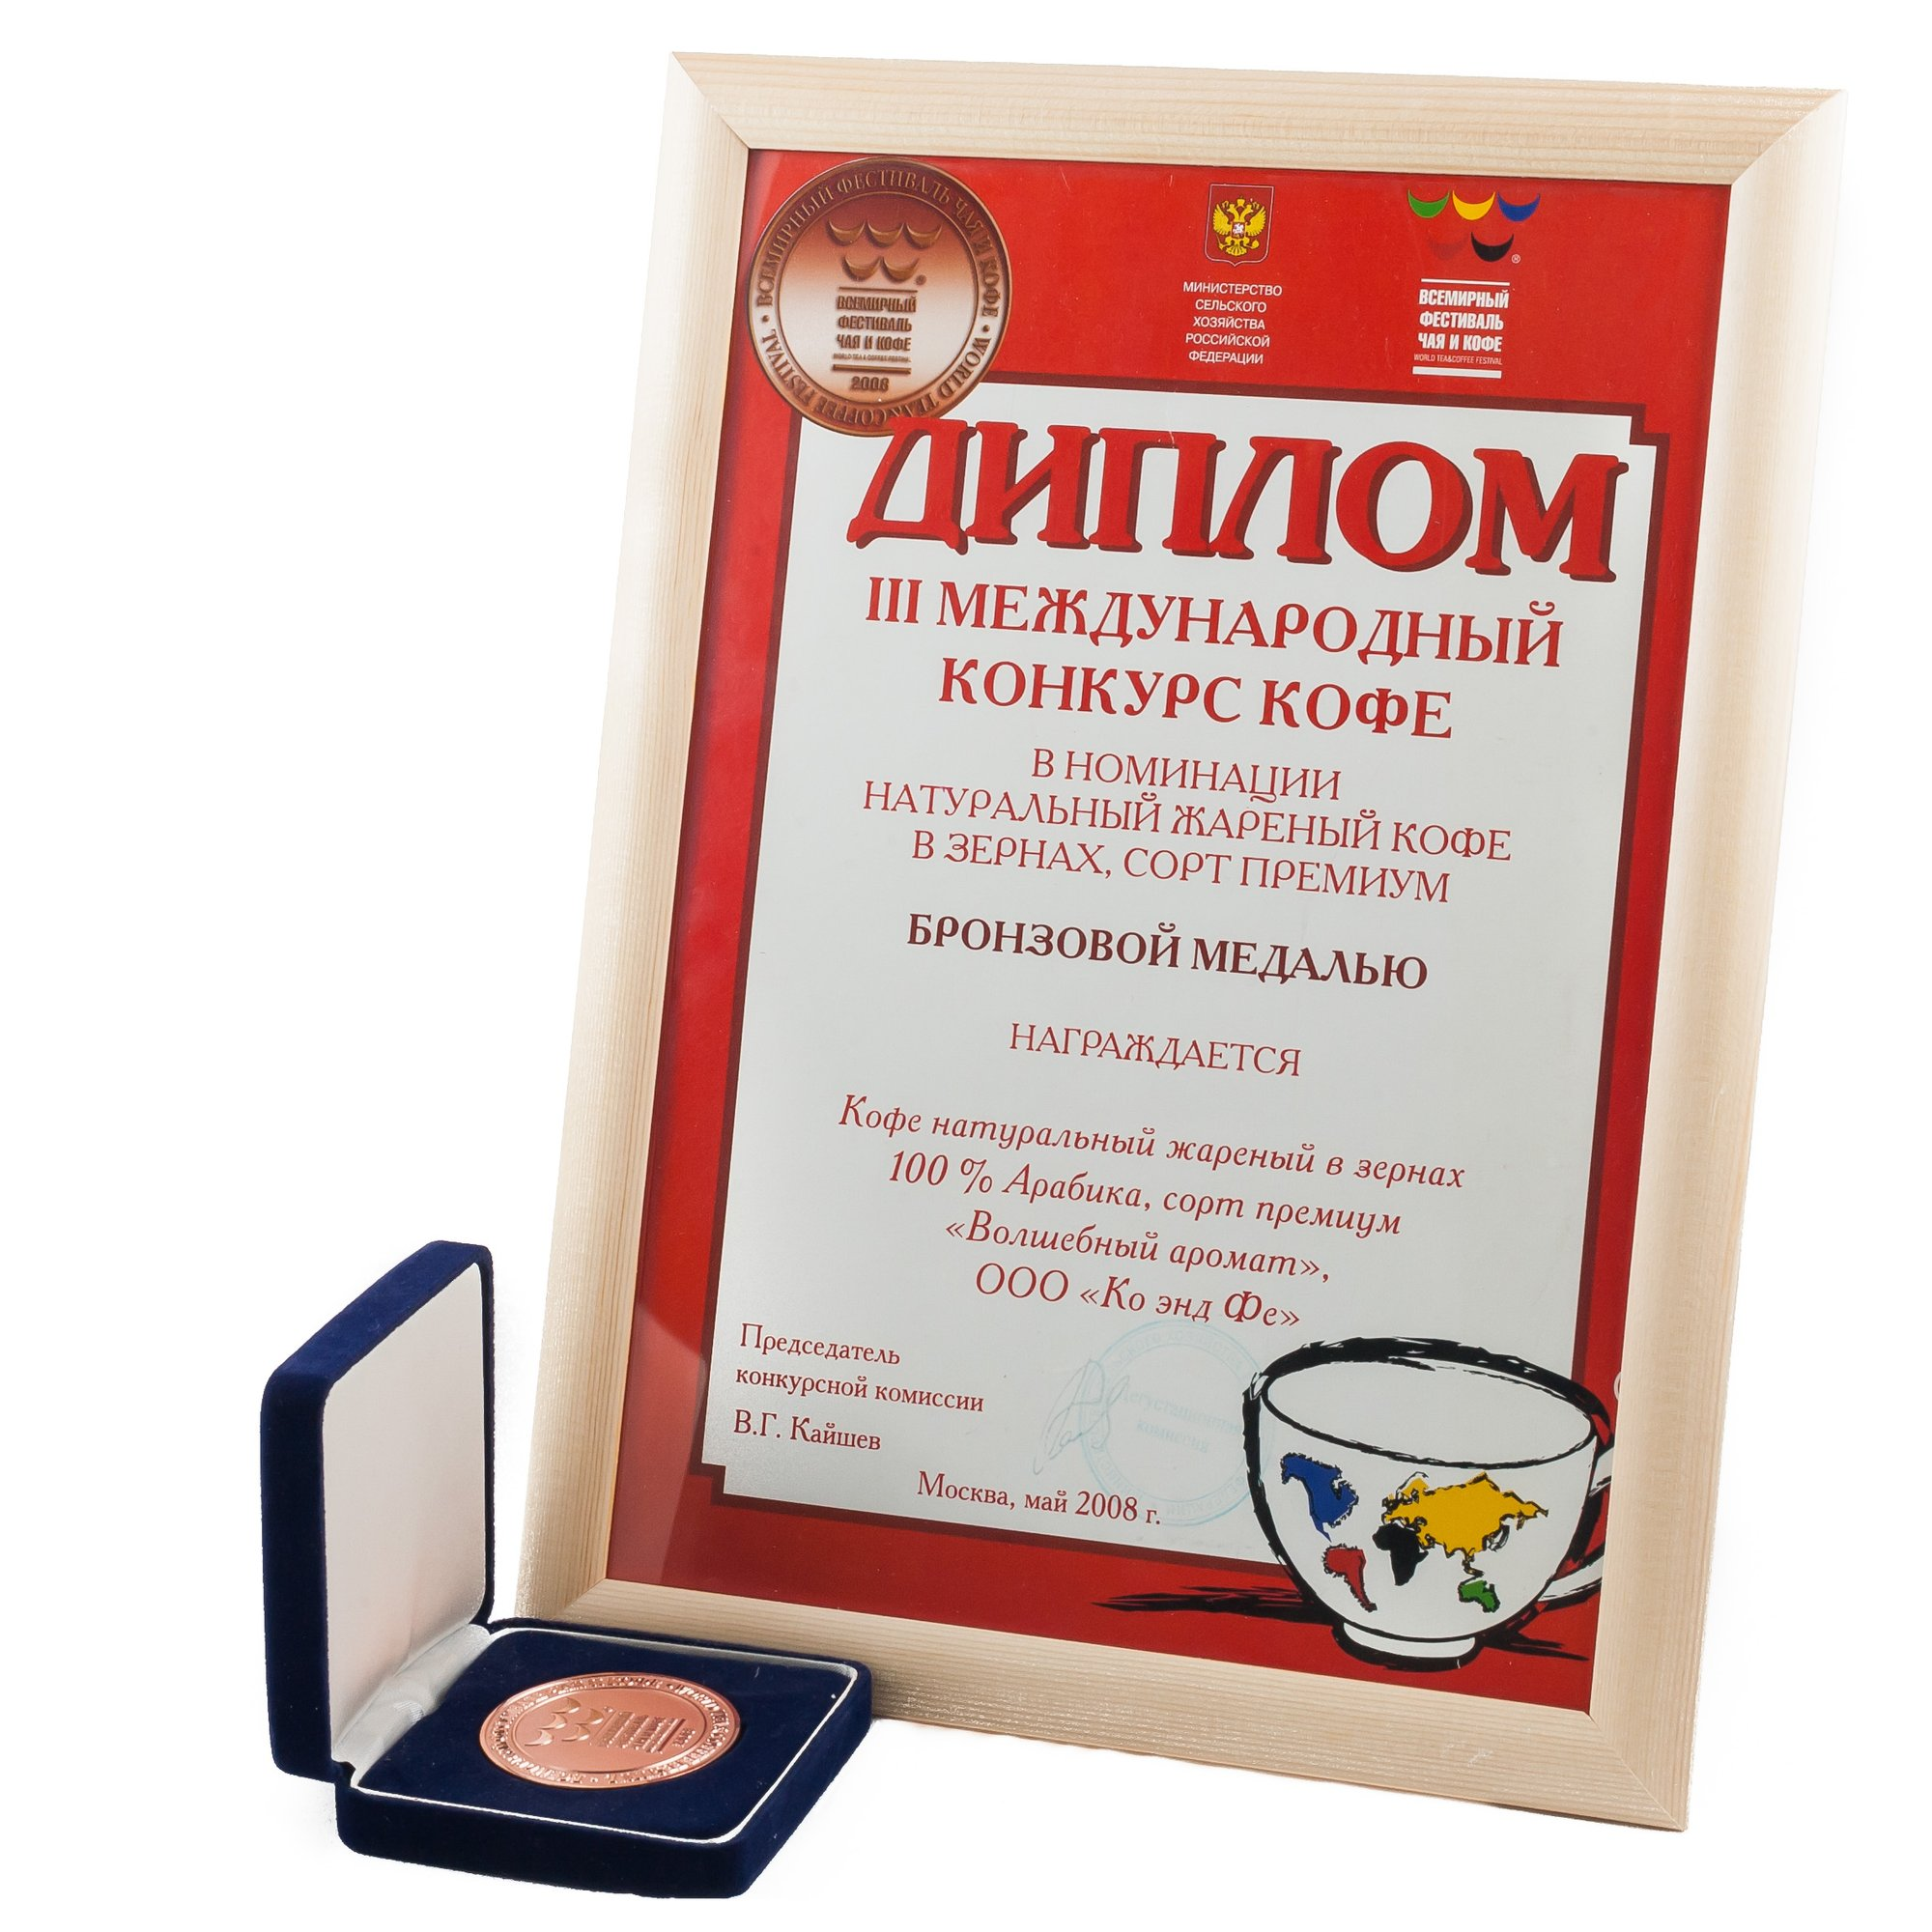 2008-vsemirnyi-festival-chaja-i-kofe-bronza.jpg